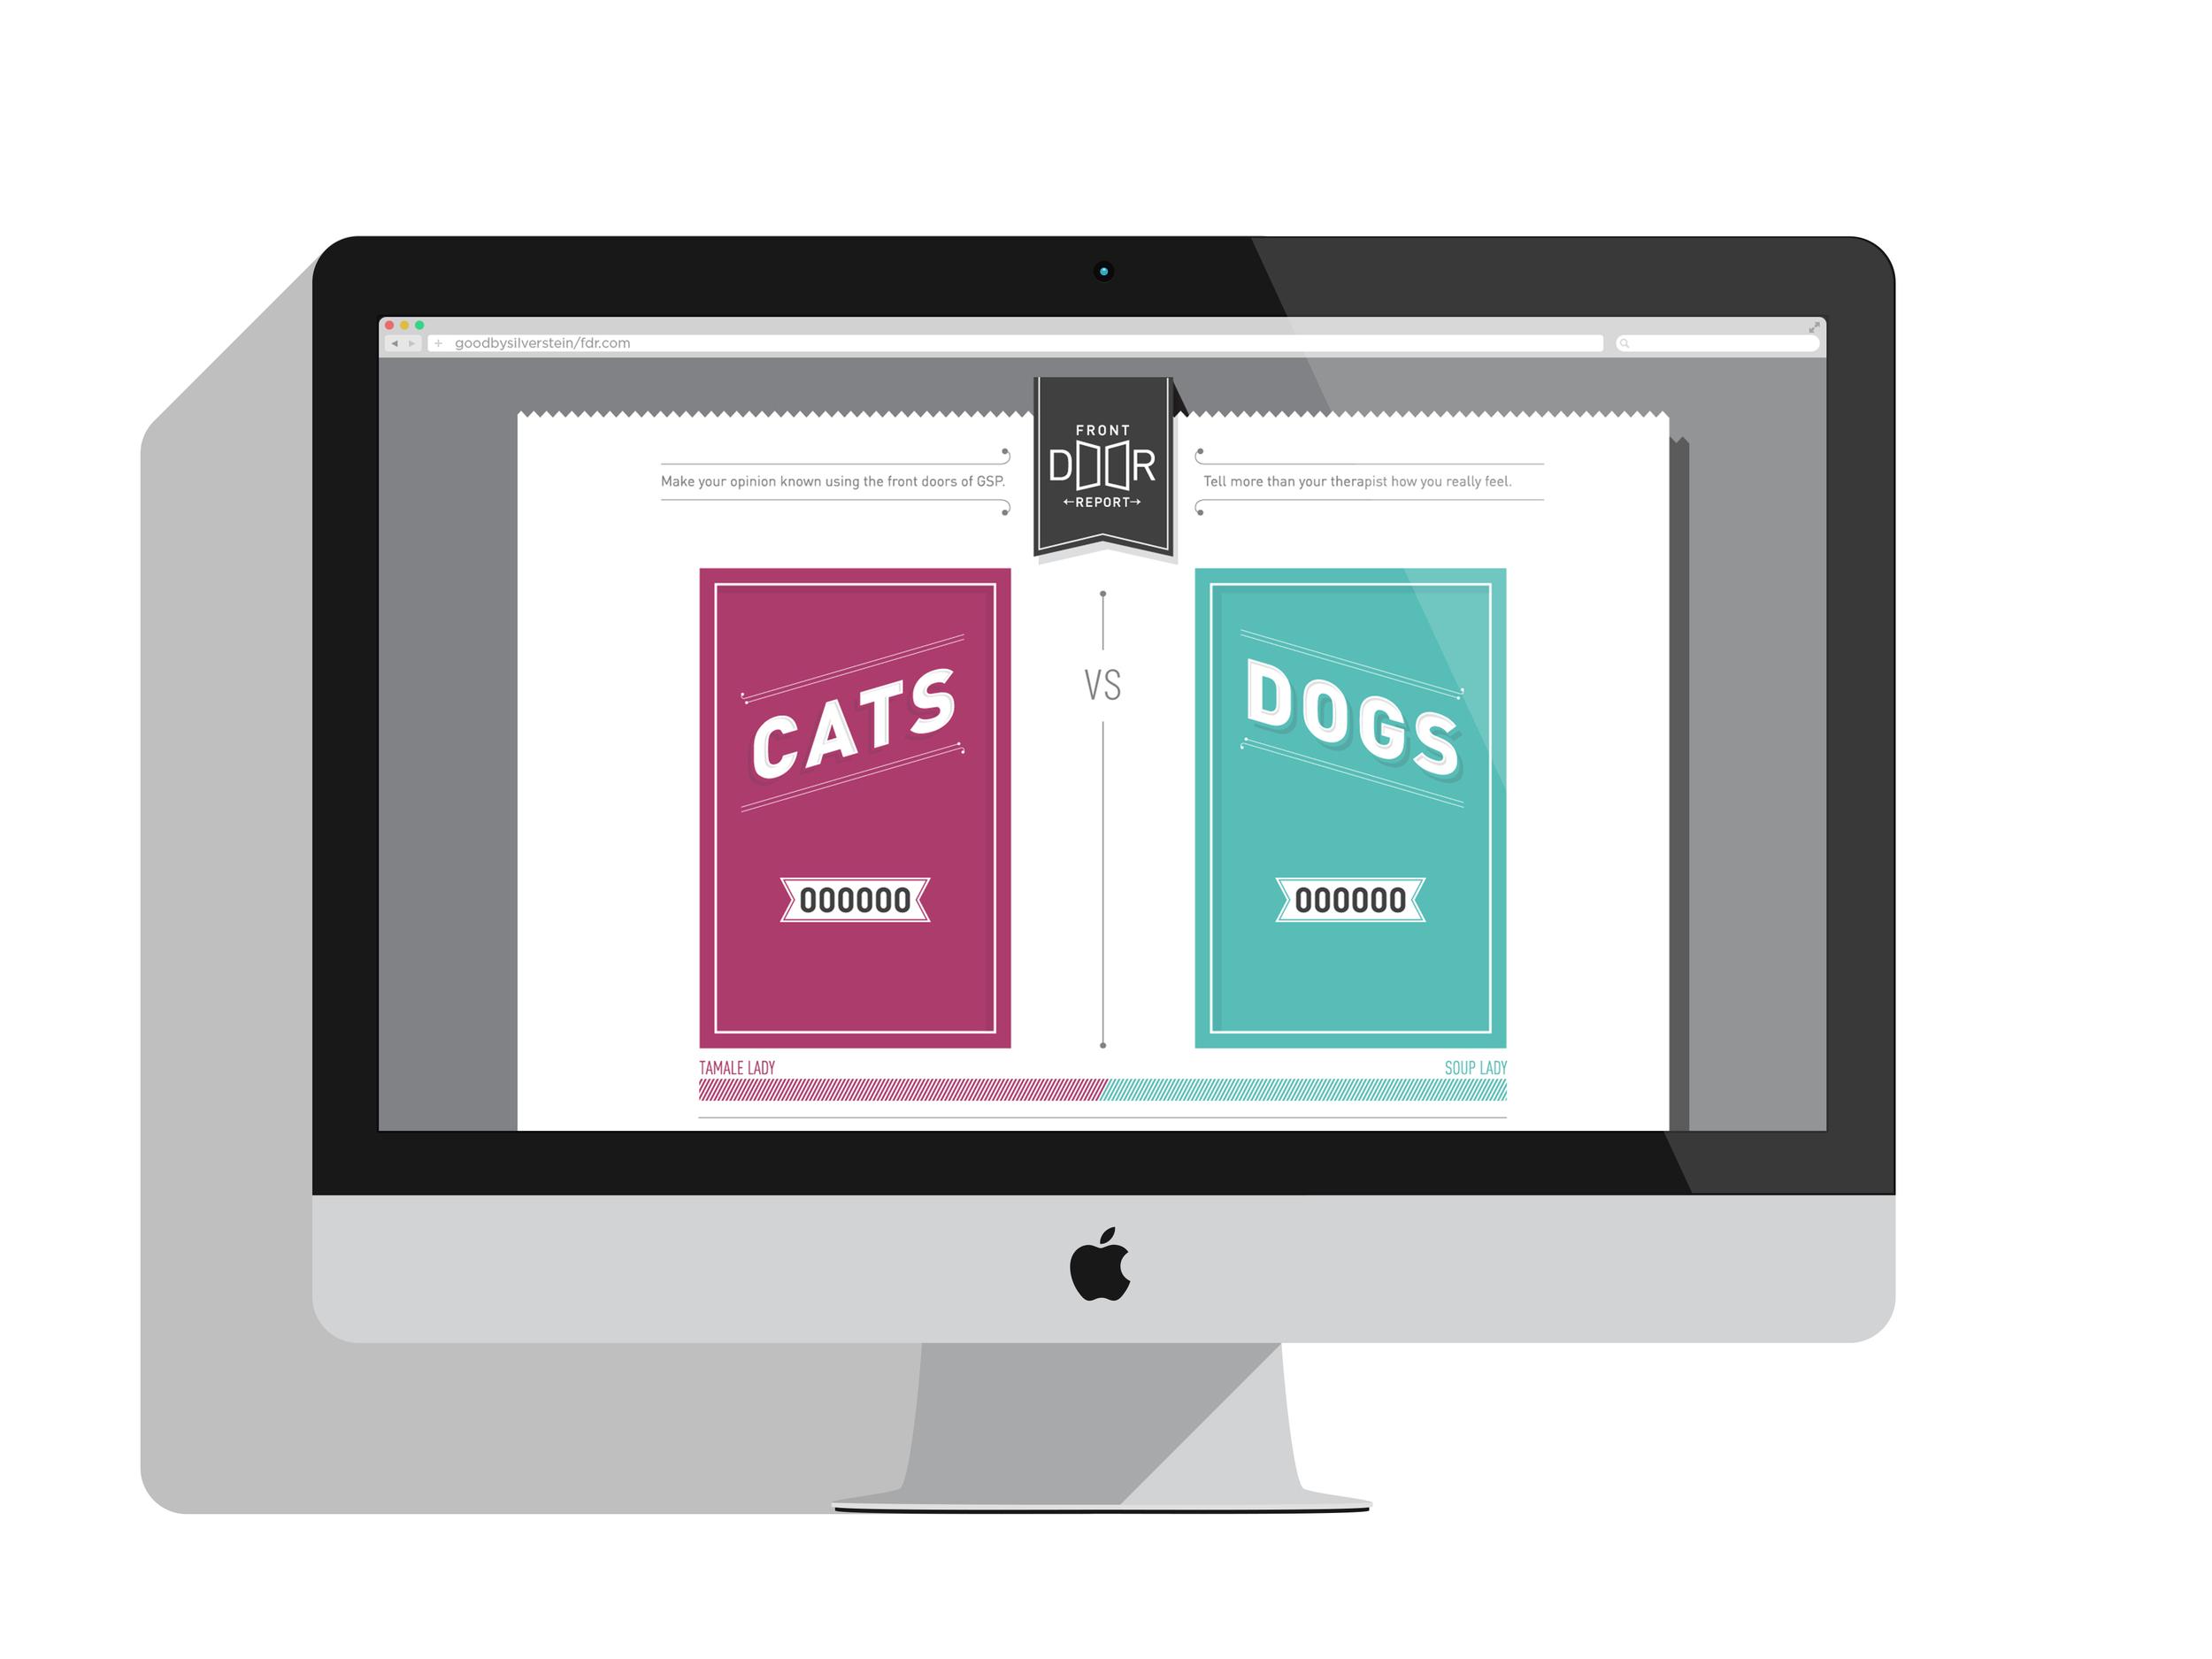 _0000_CATS_DOGS.jpg